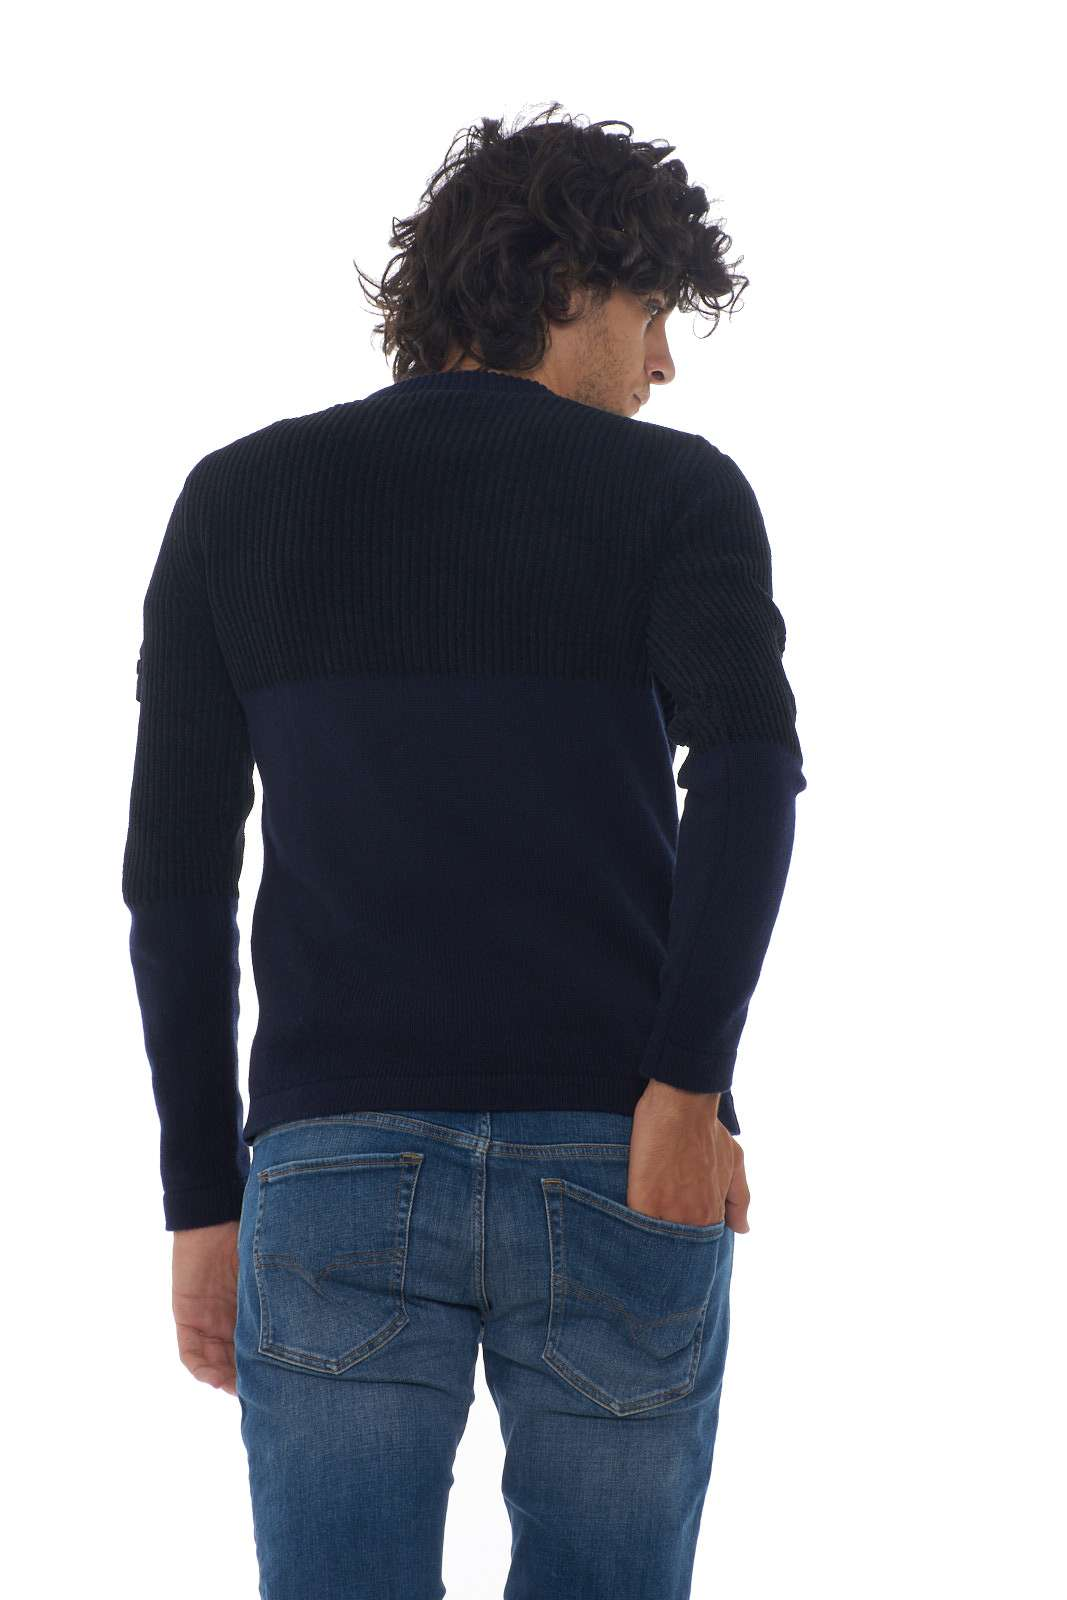 https://www.parmax.com/media/catalog/product/a/i/AI-outlet_parmax-maglia-uomo-Stone-Island-7115520B8-C.jpg